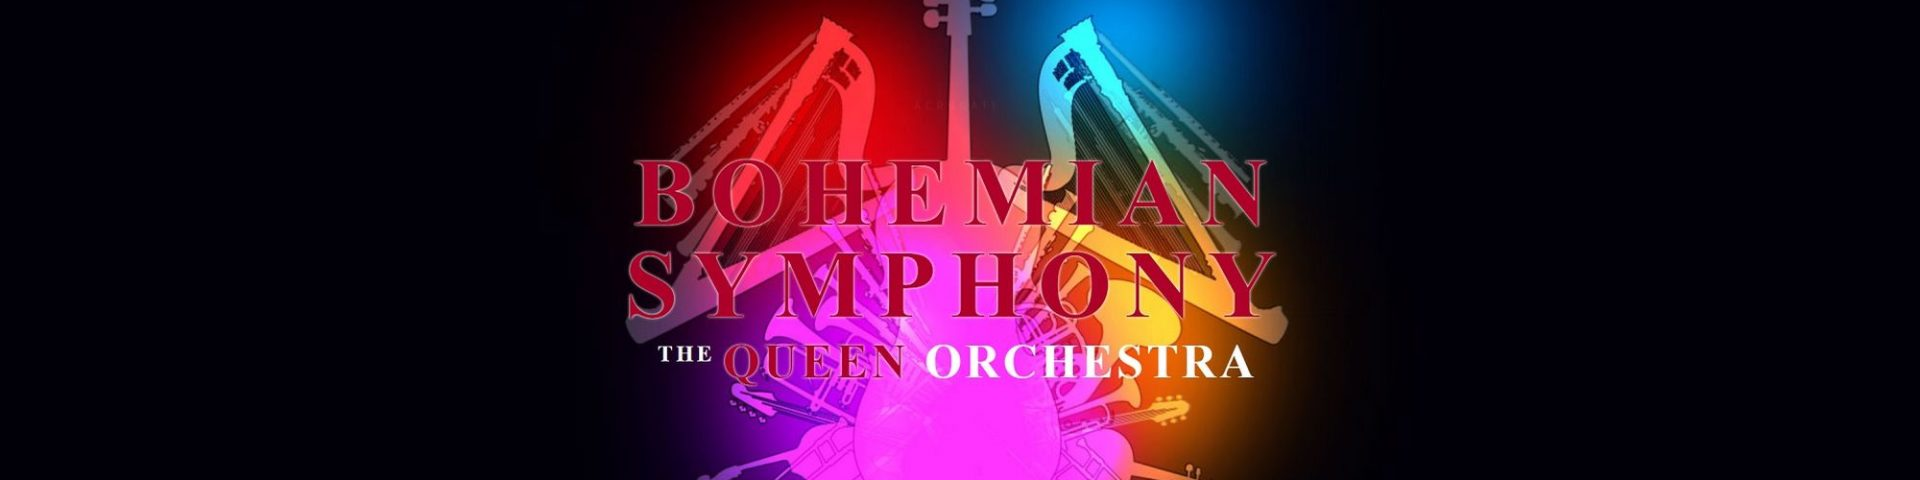 Bohemian Symphony – The Queen Orchestra a Terracina – 28/08/19: biglietti, scaletta